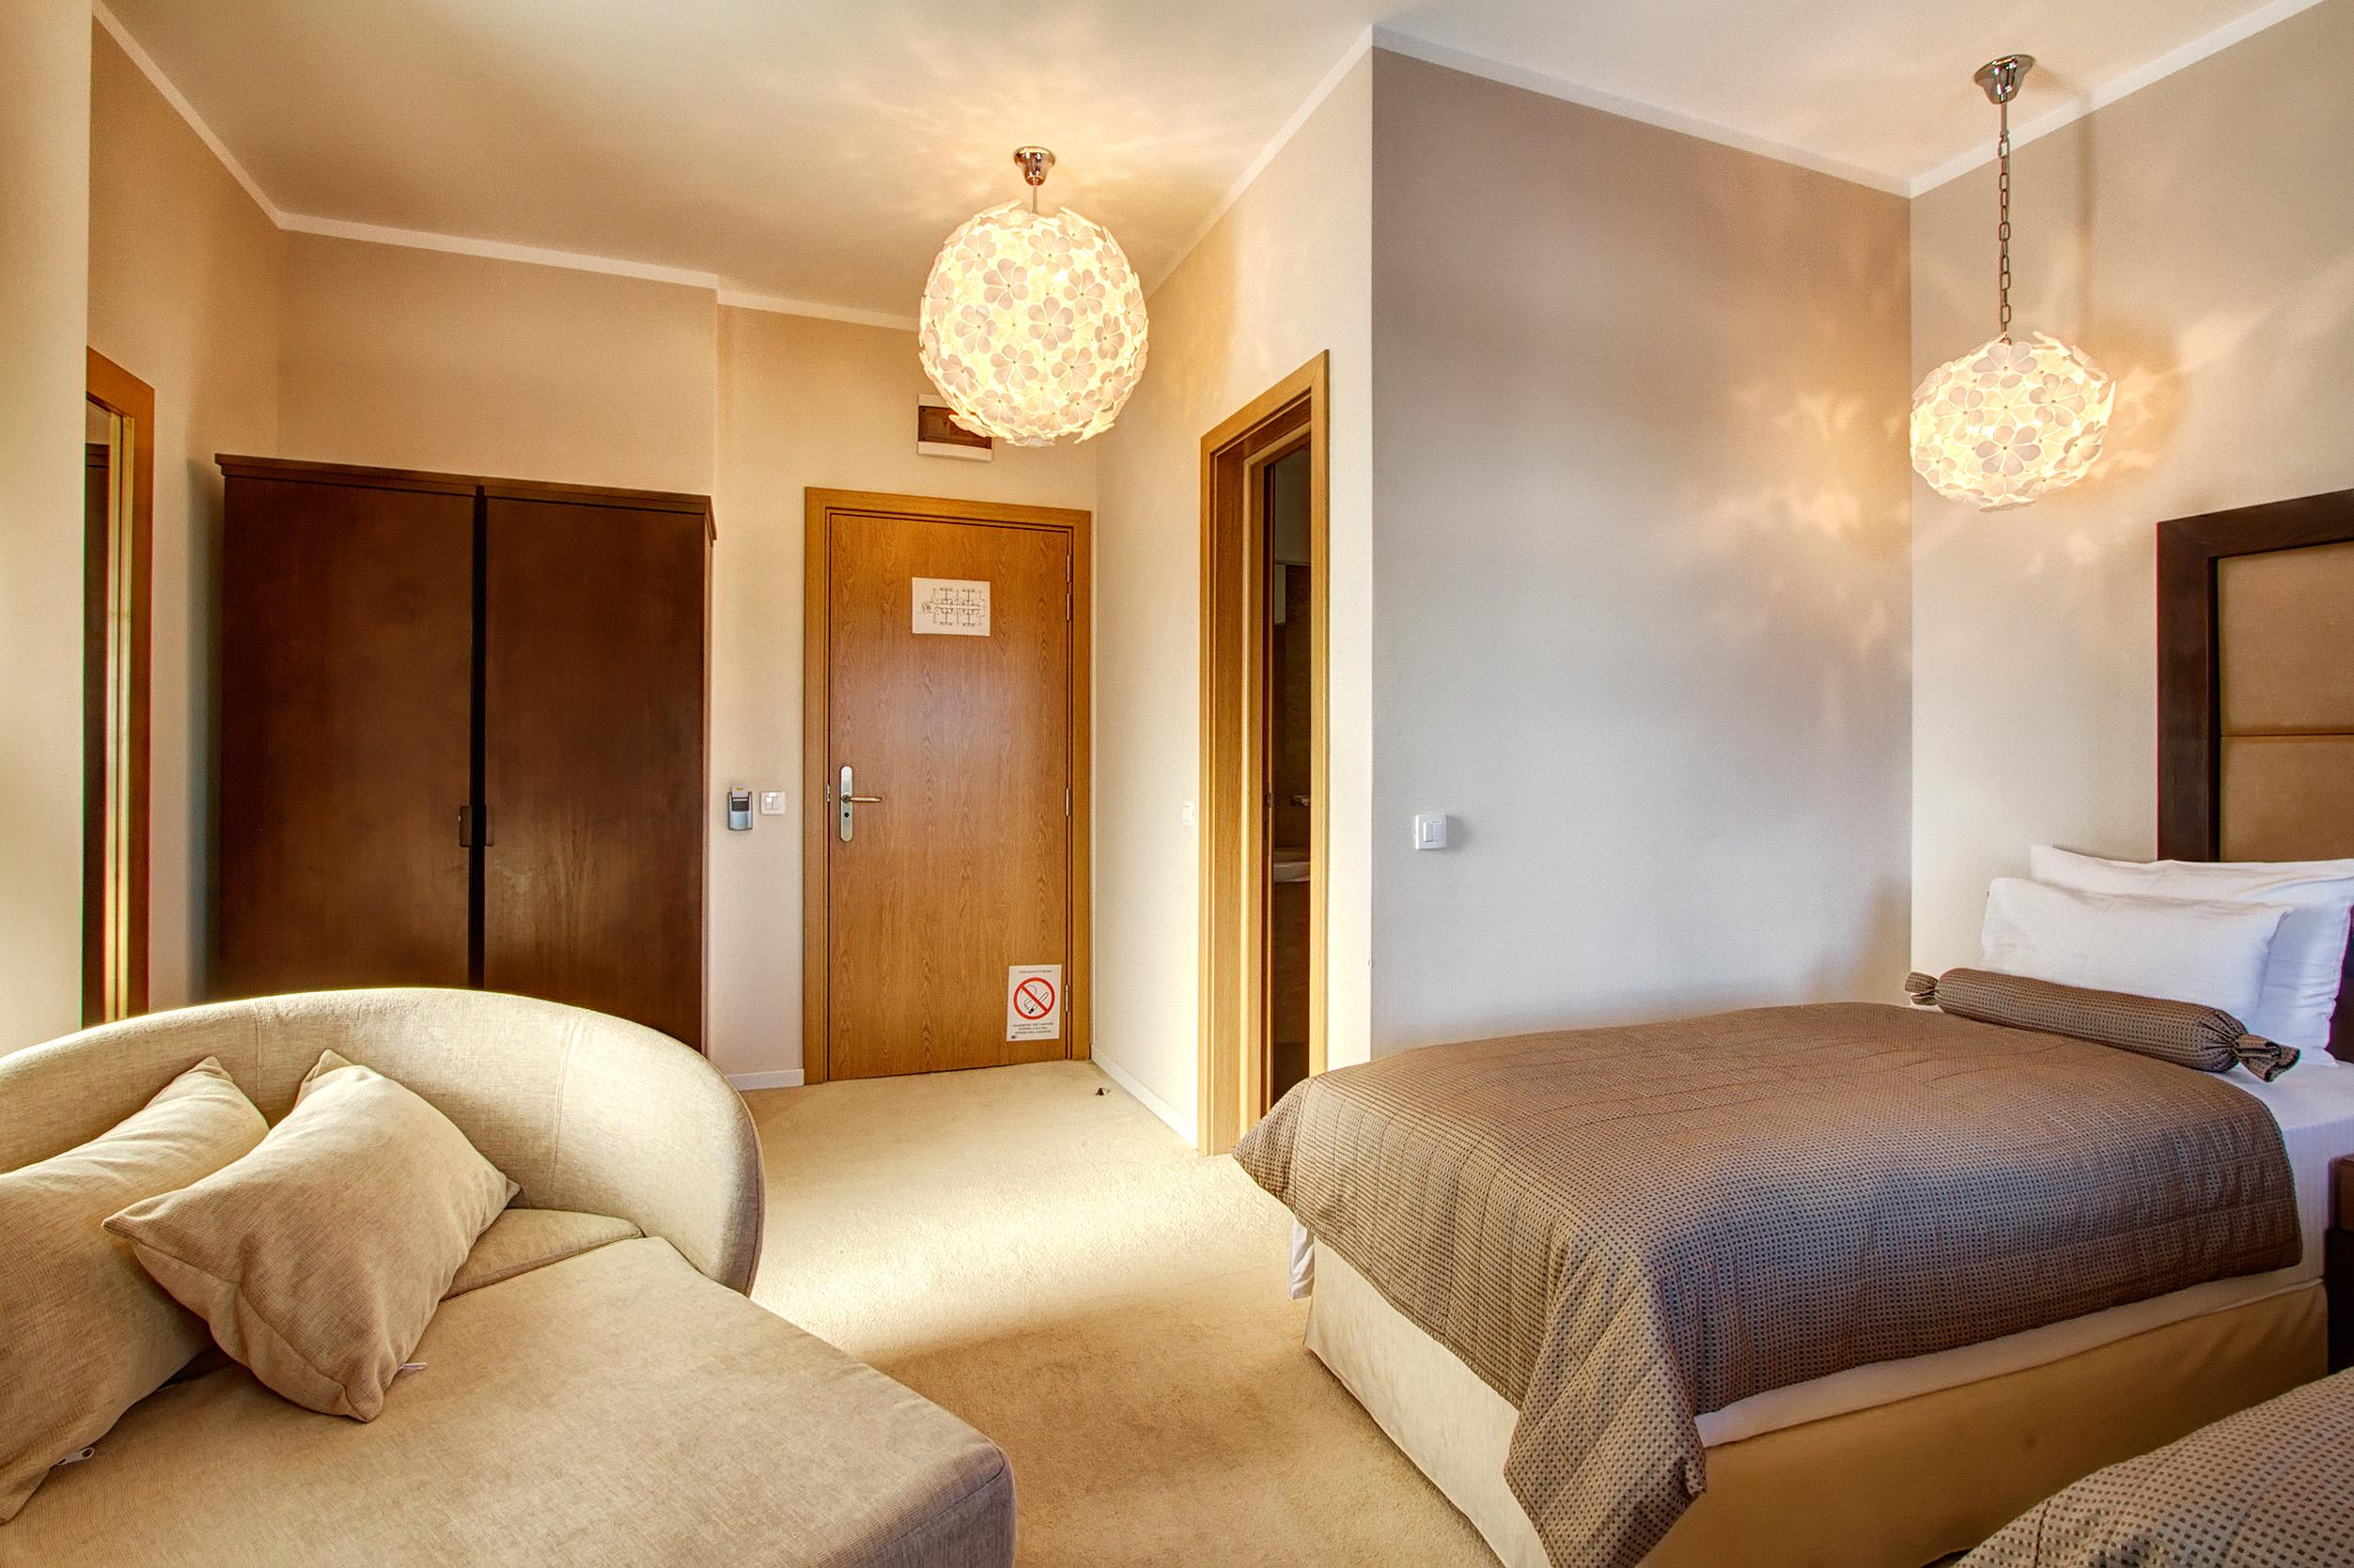 Zlatibor, smestaj, letnji odmor, spavanje, pansion, spa, soba, apartman, akcija, nova godina, hotel mir 25